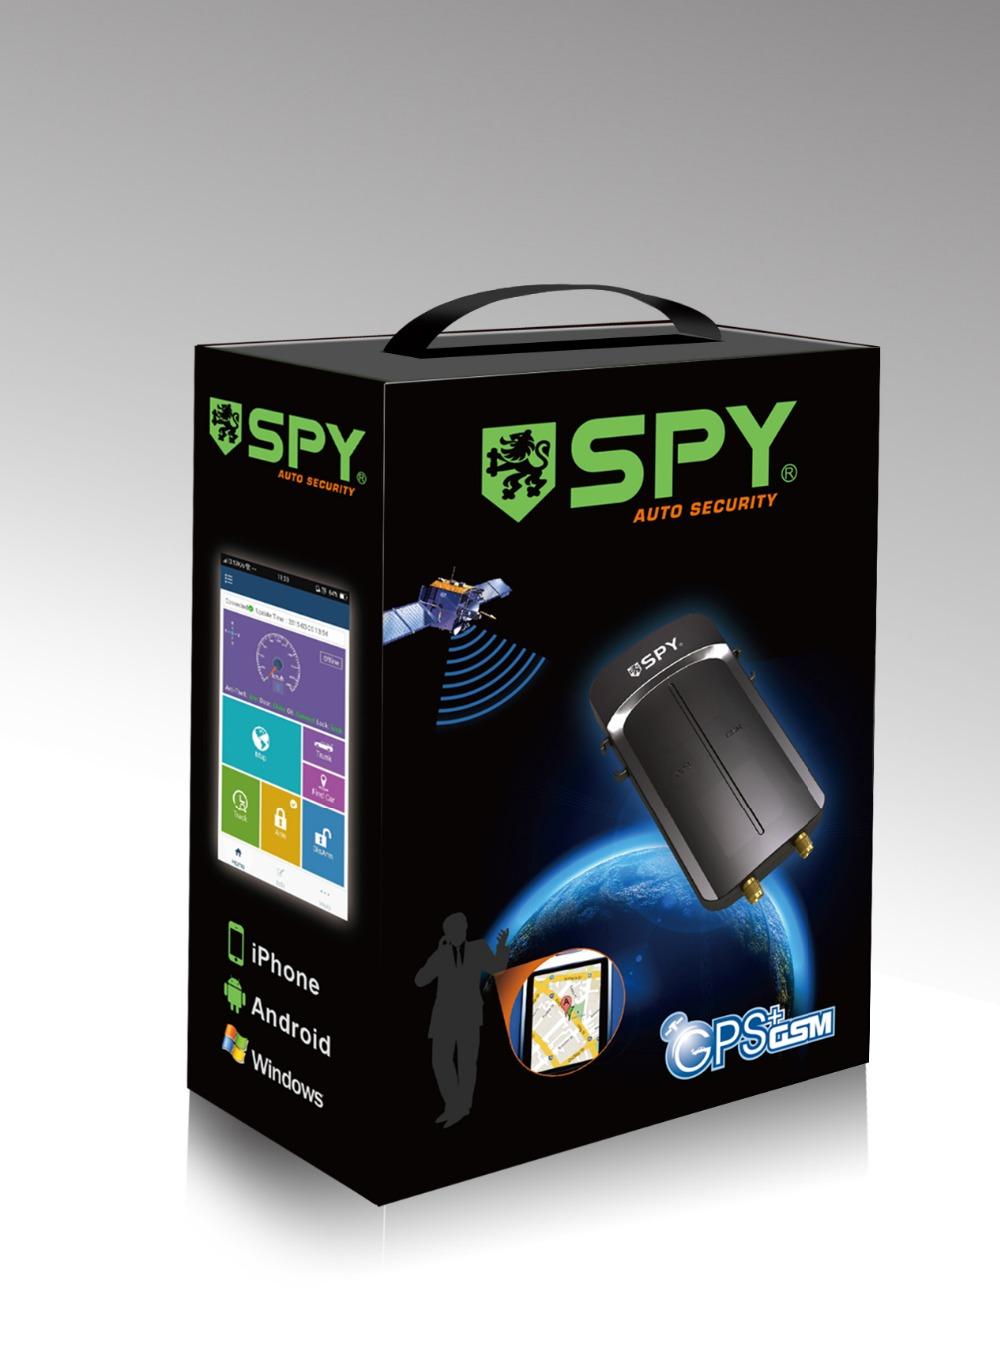 Spy Car Gps Tracker Systemreal Time Tracking Via Smartphone Or 15v Transmitter System Real Computer